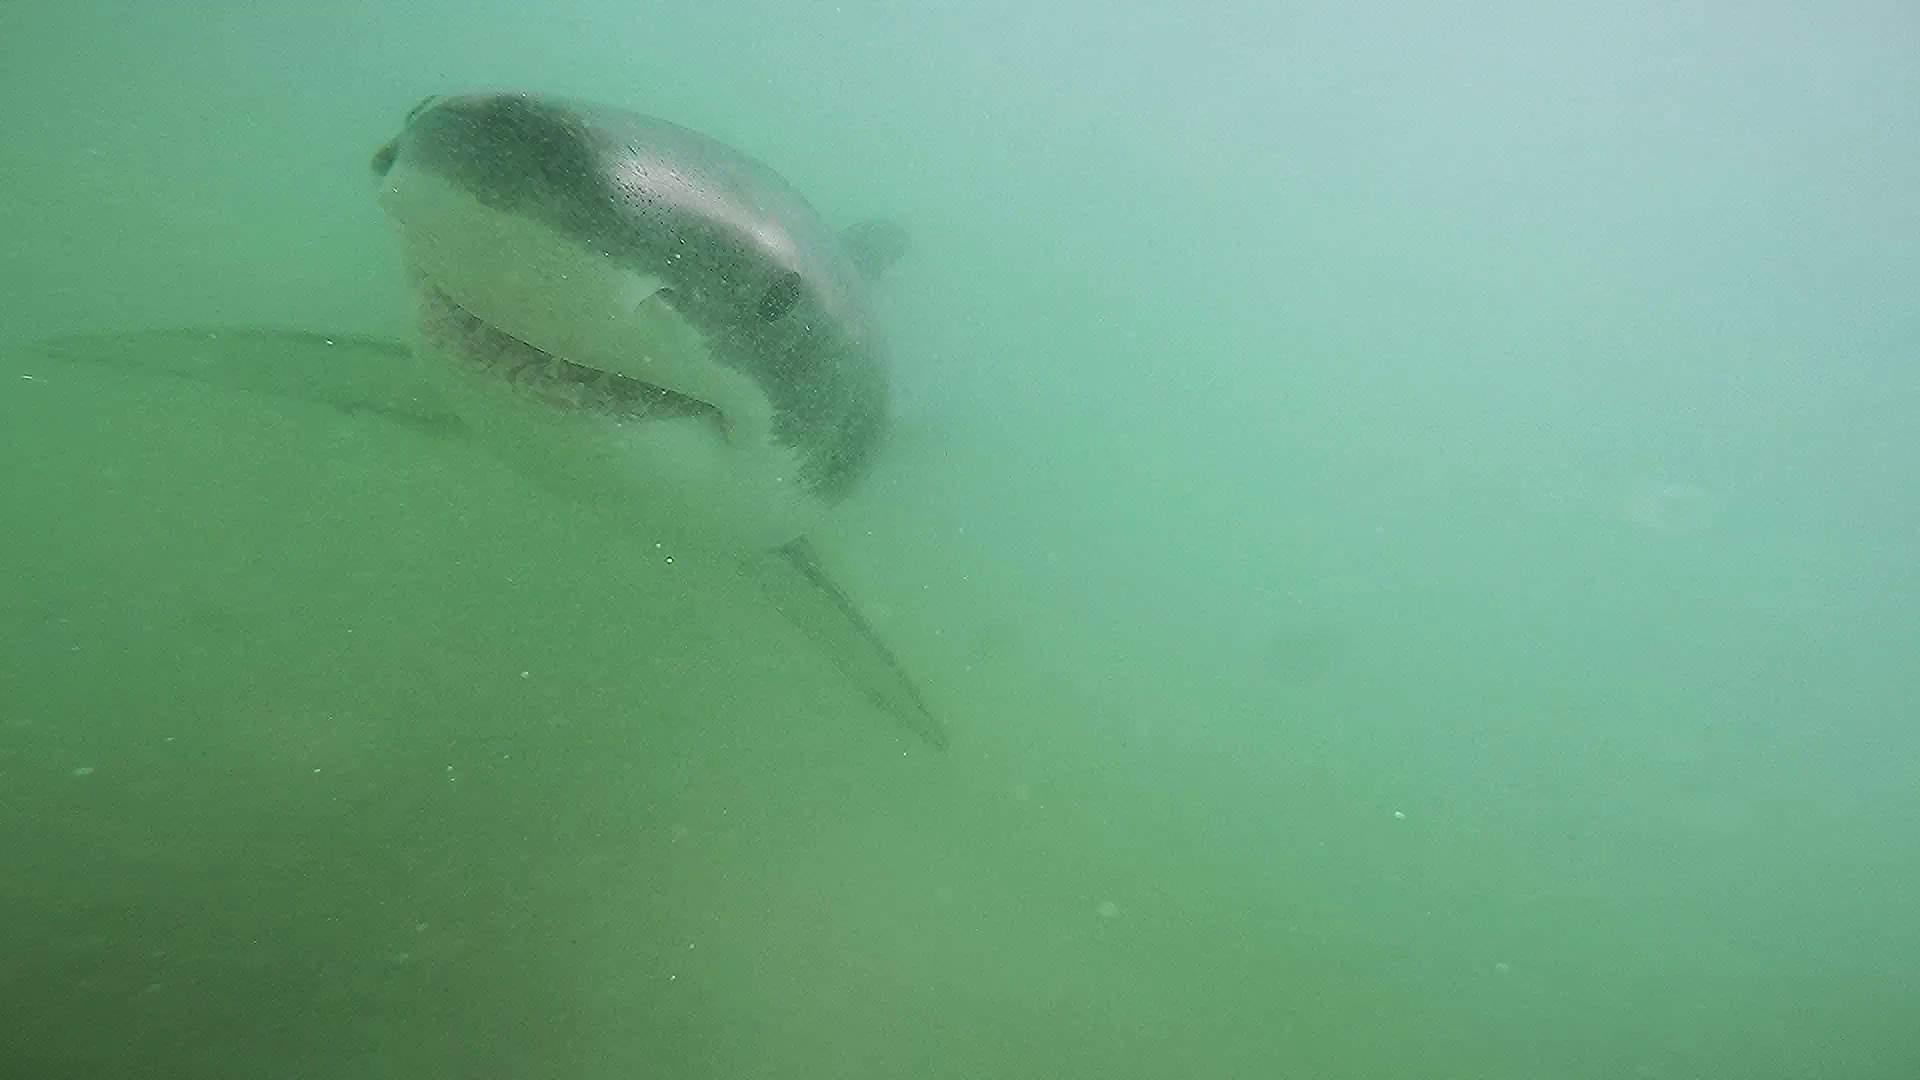 Pelagic Great White Sharks SoCal CSULB 5